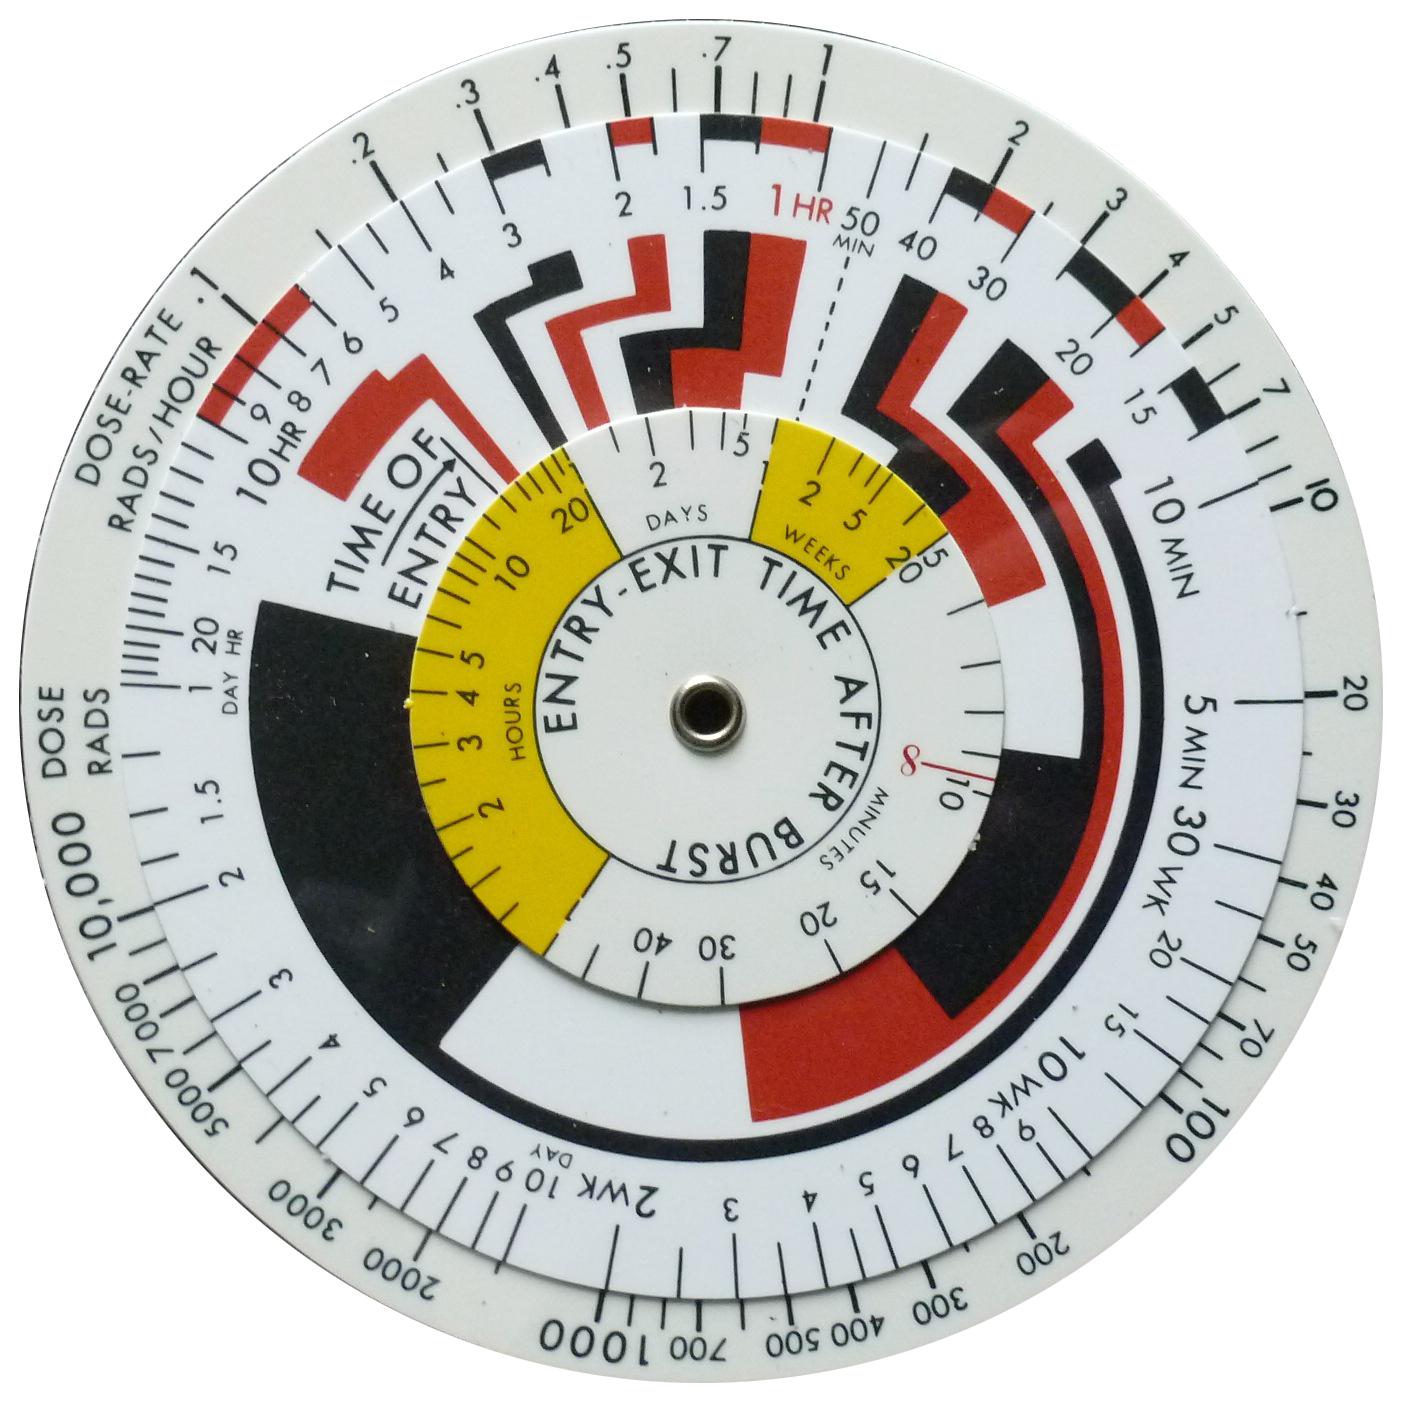 radiac-calculator-abc-m1a1-front